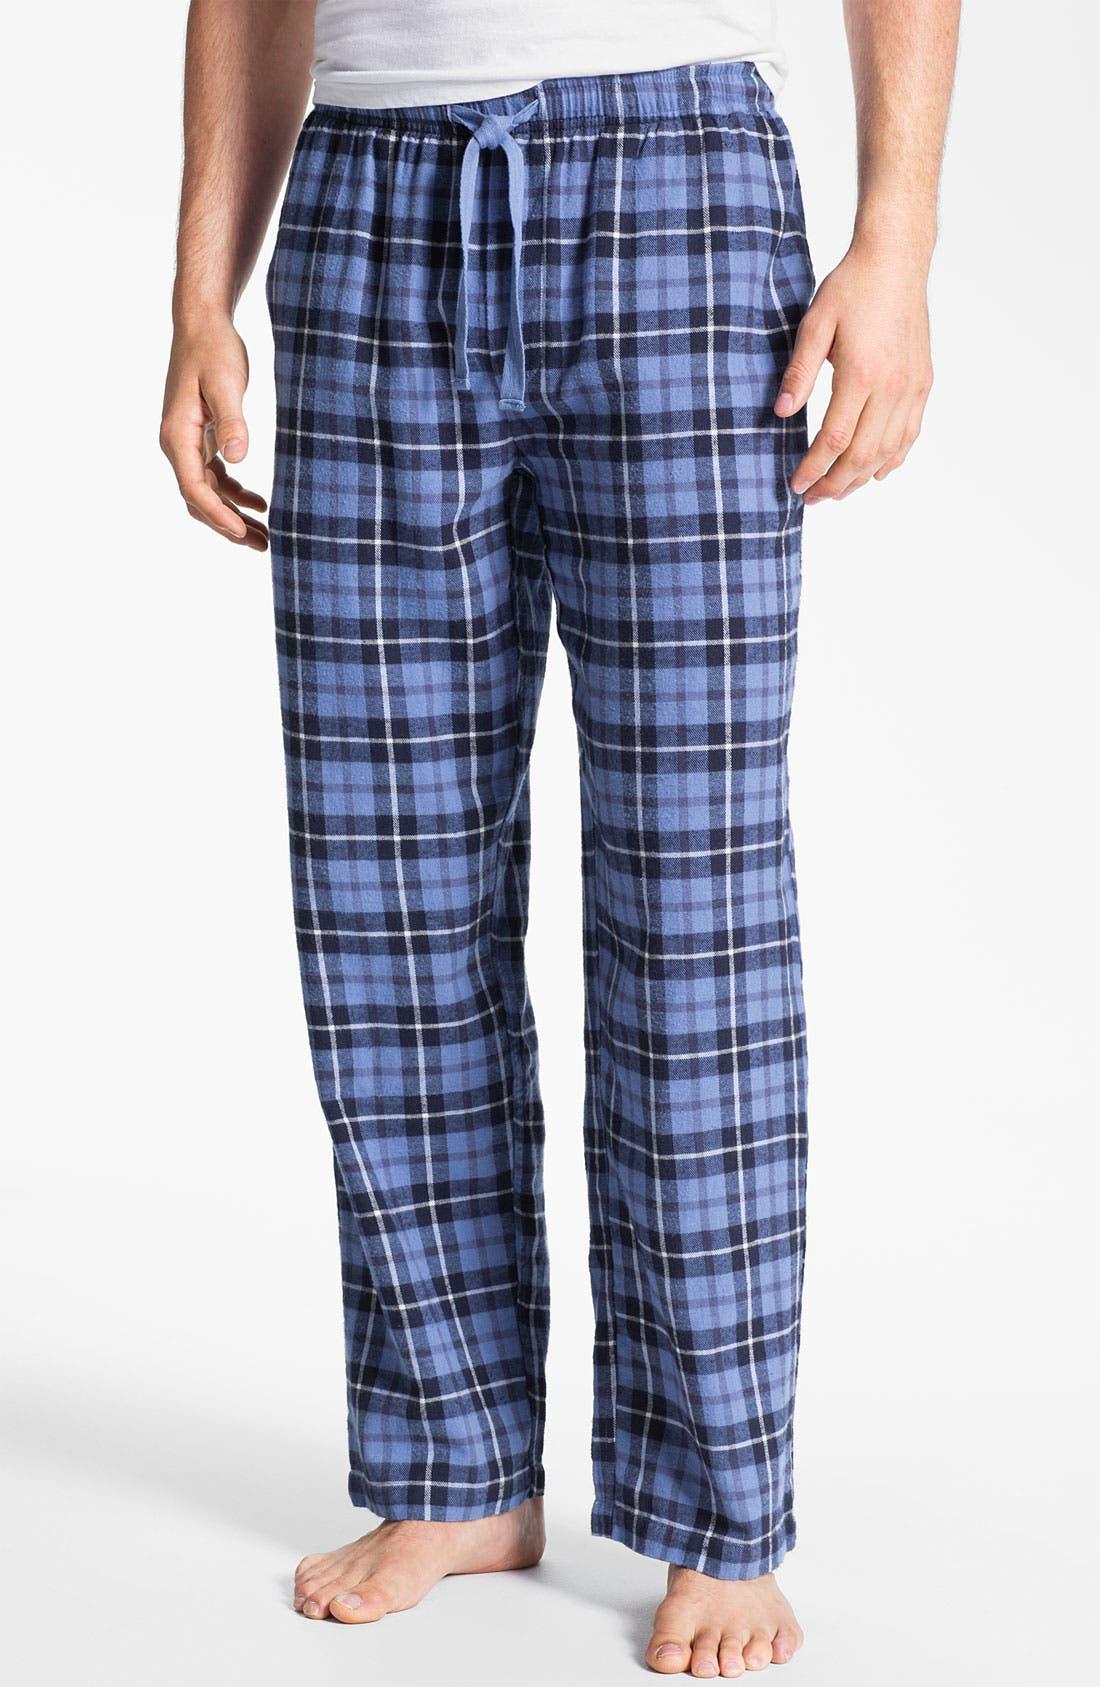 Alternate Image 1 Selected - 1901 Flannel Sleep Pants